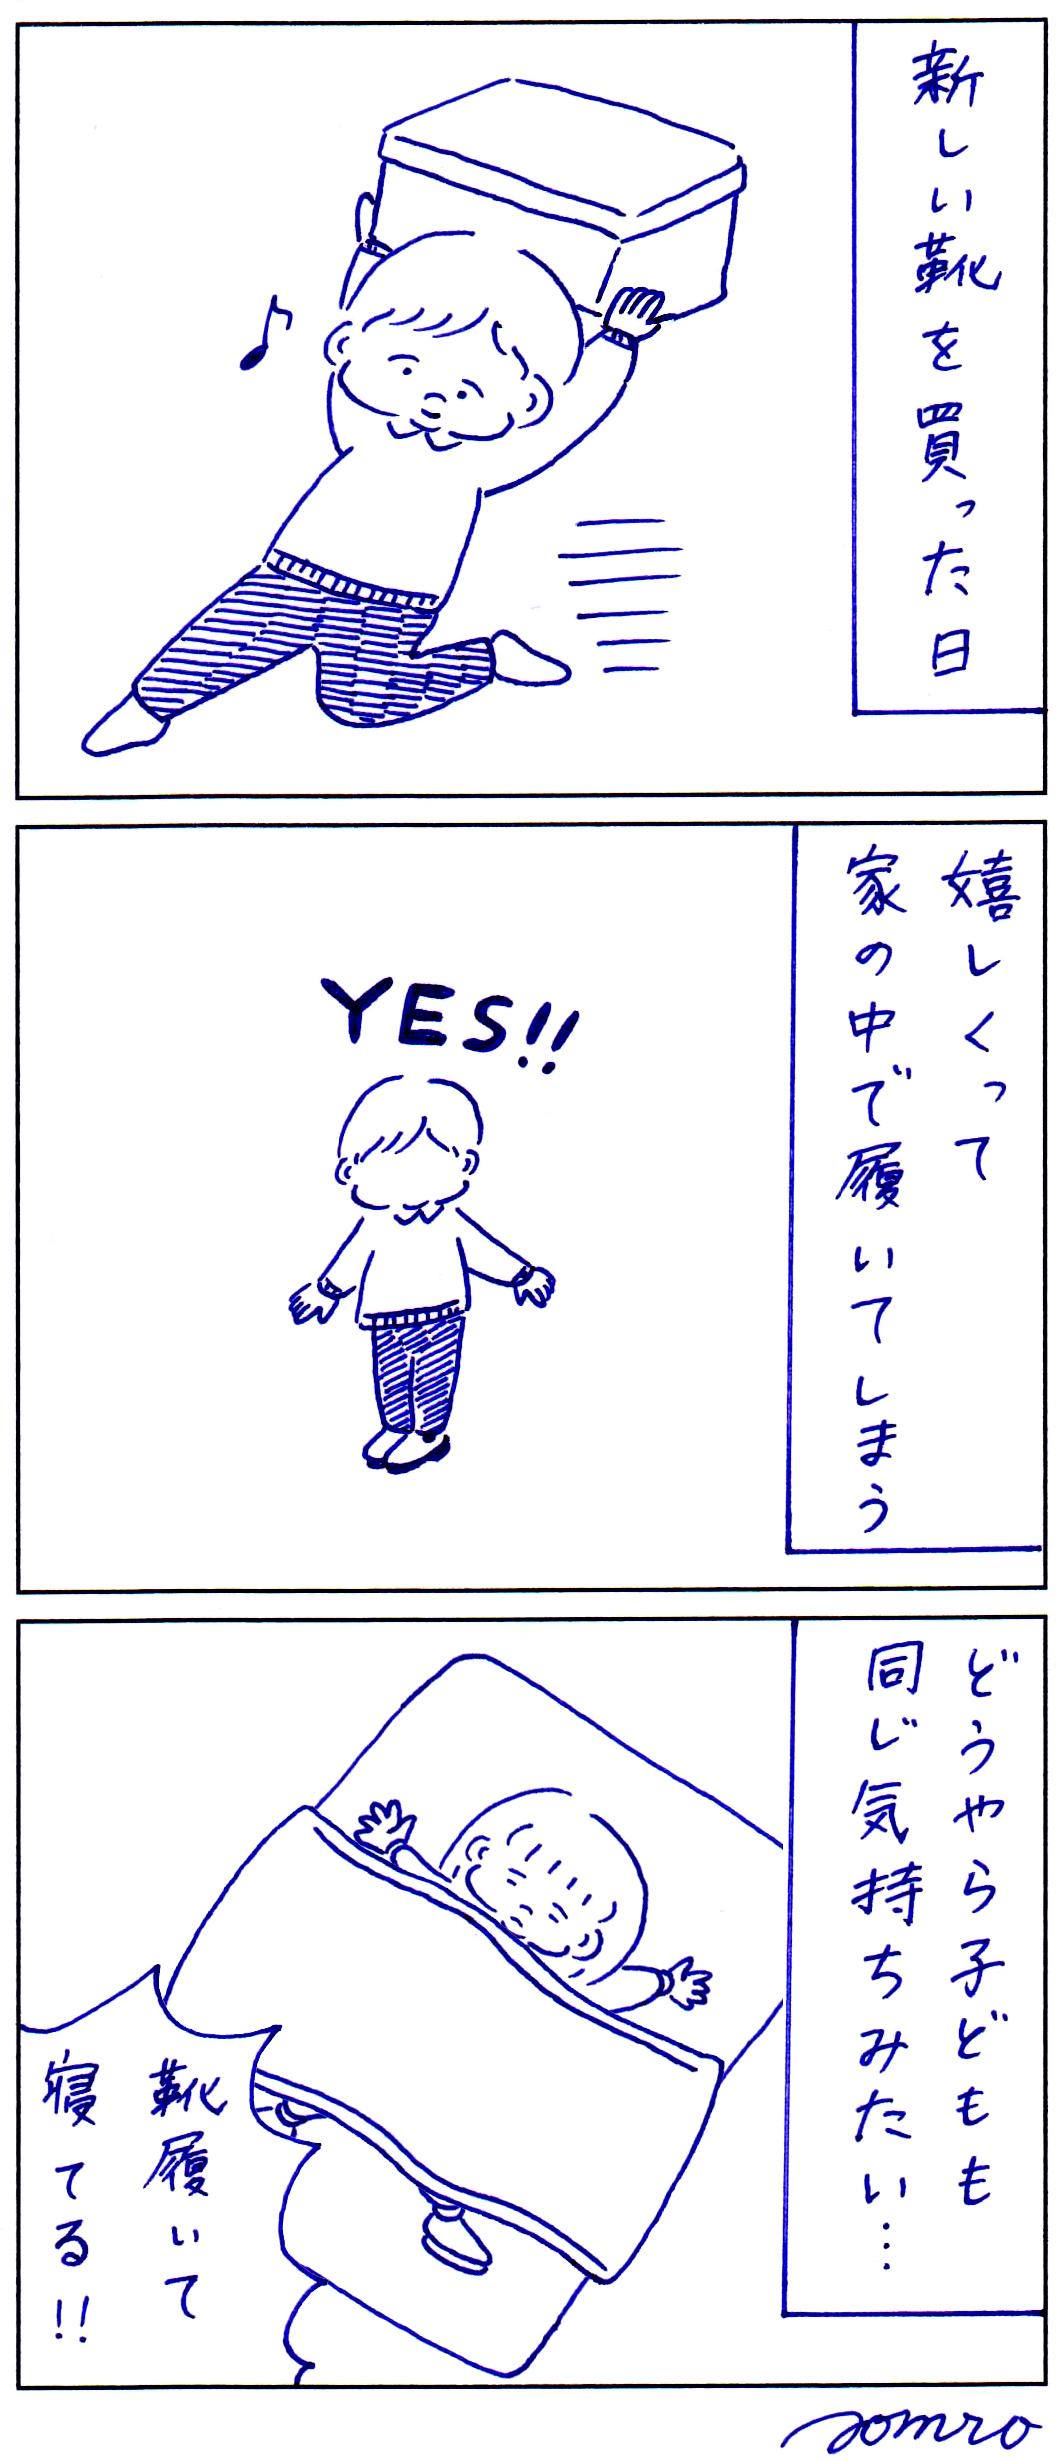 1701_02